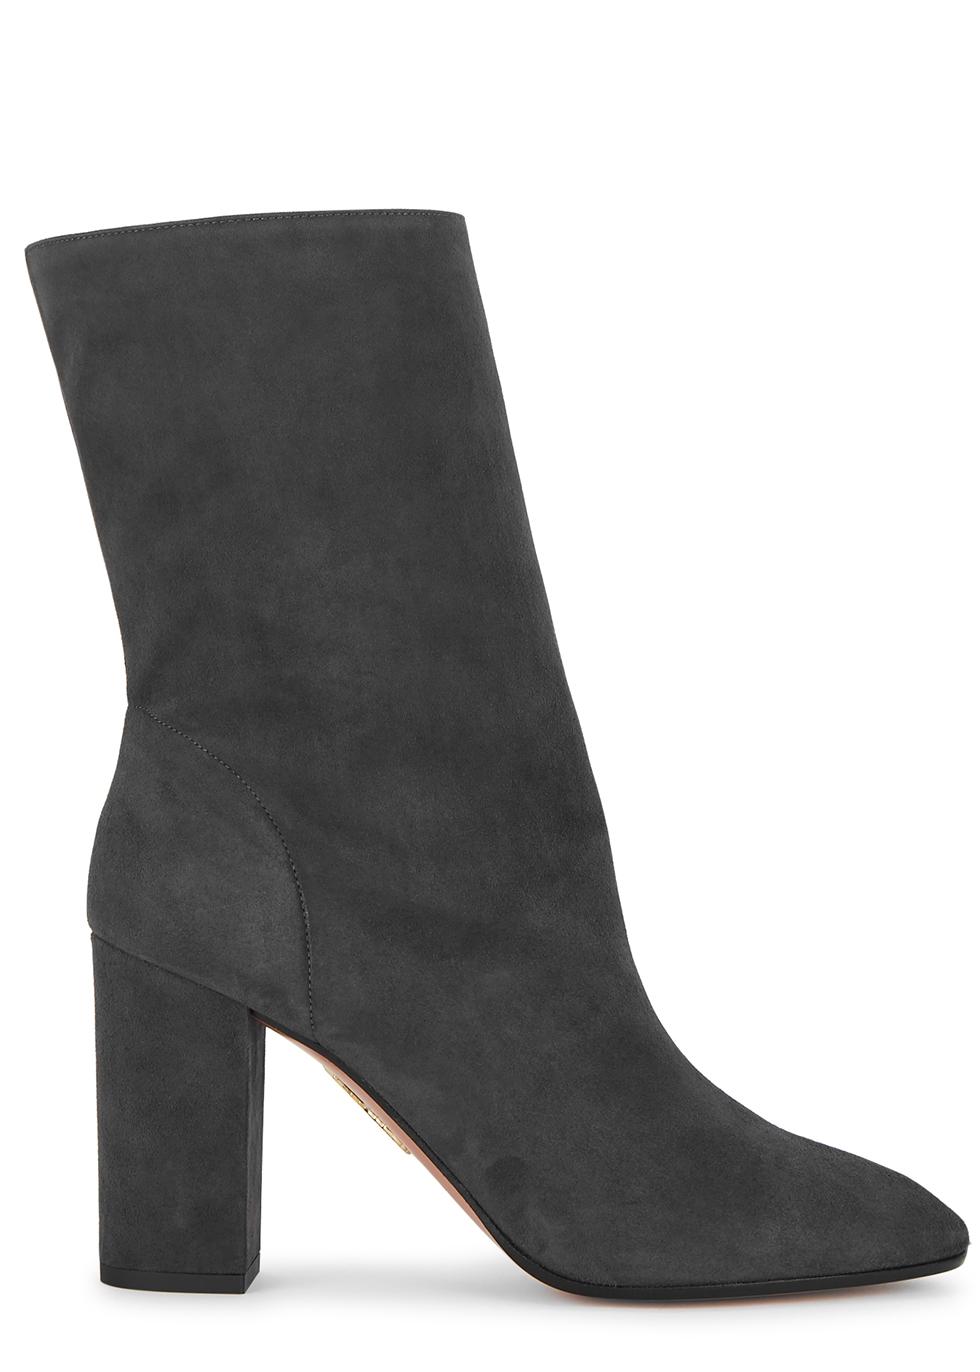 Boogie 85 dark grey suede ankle boots